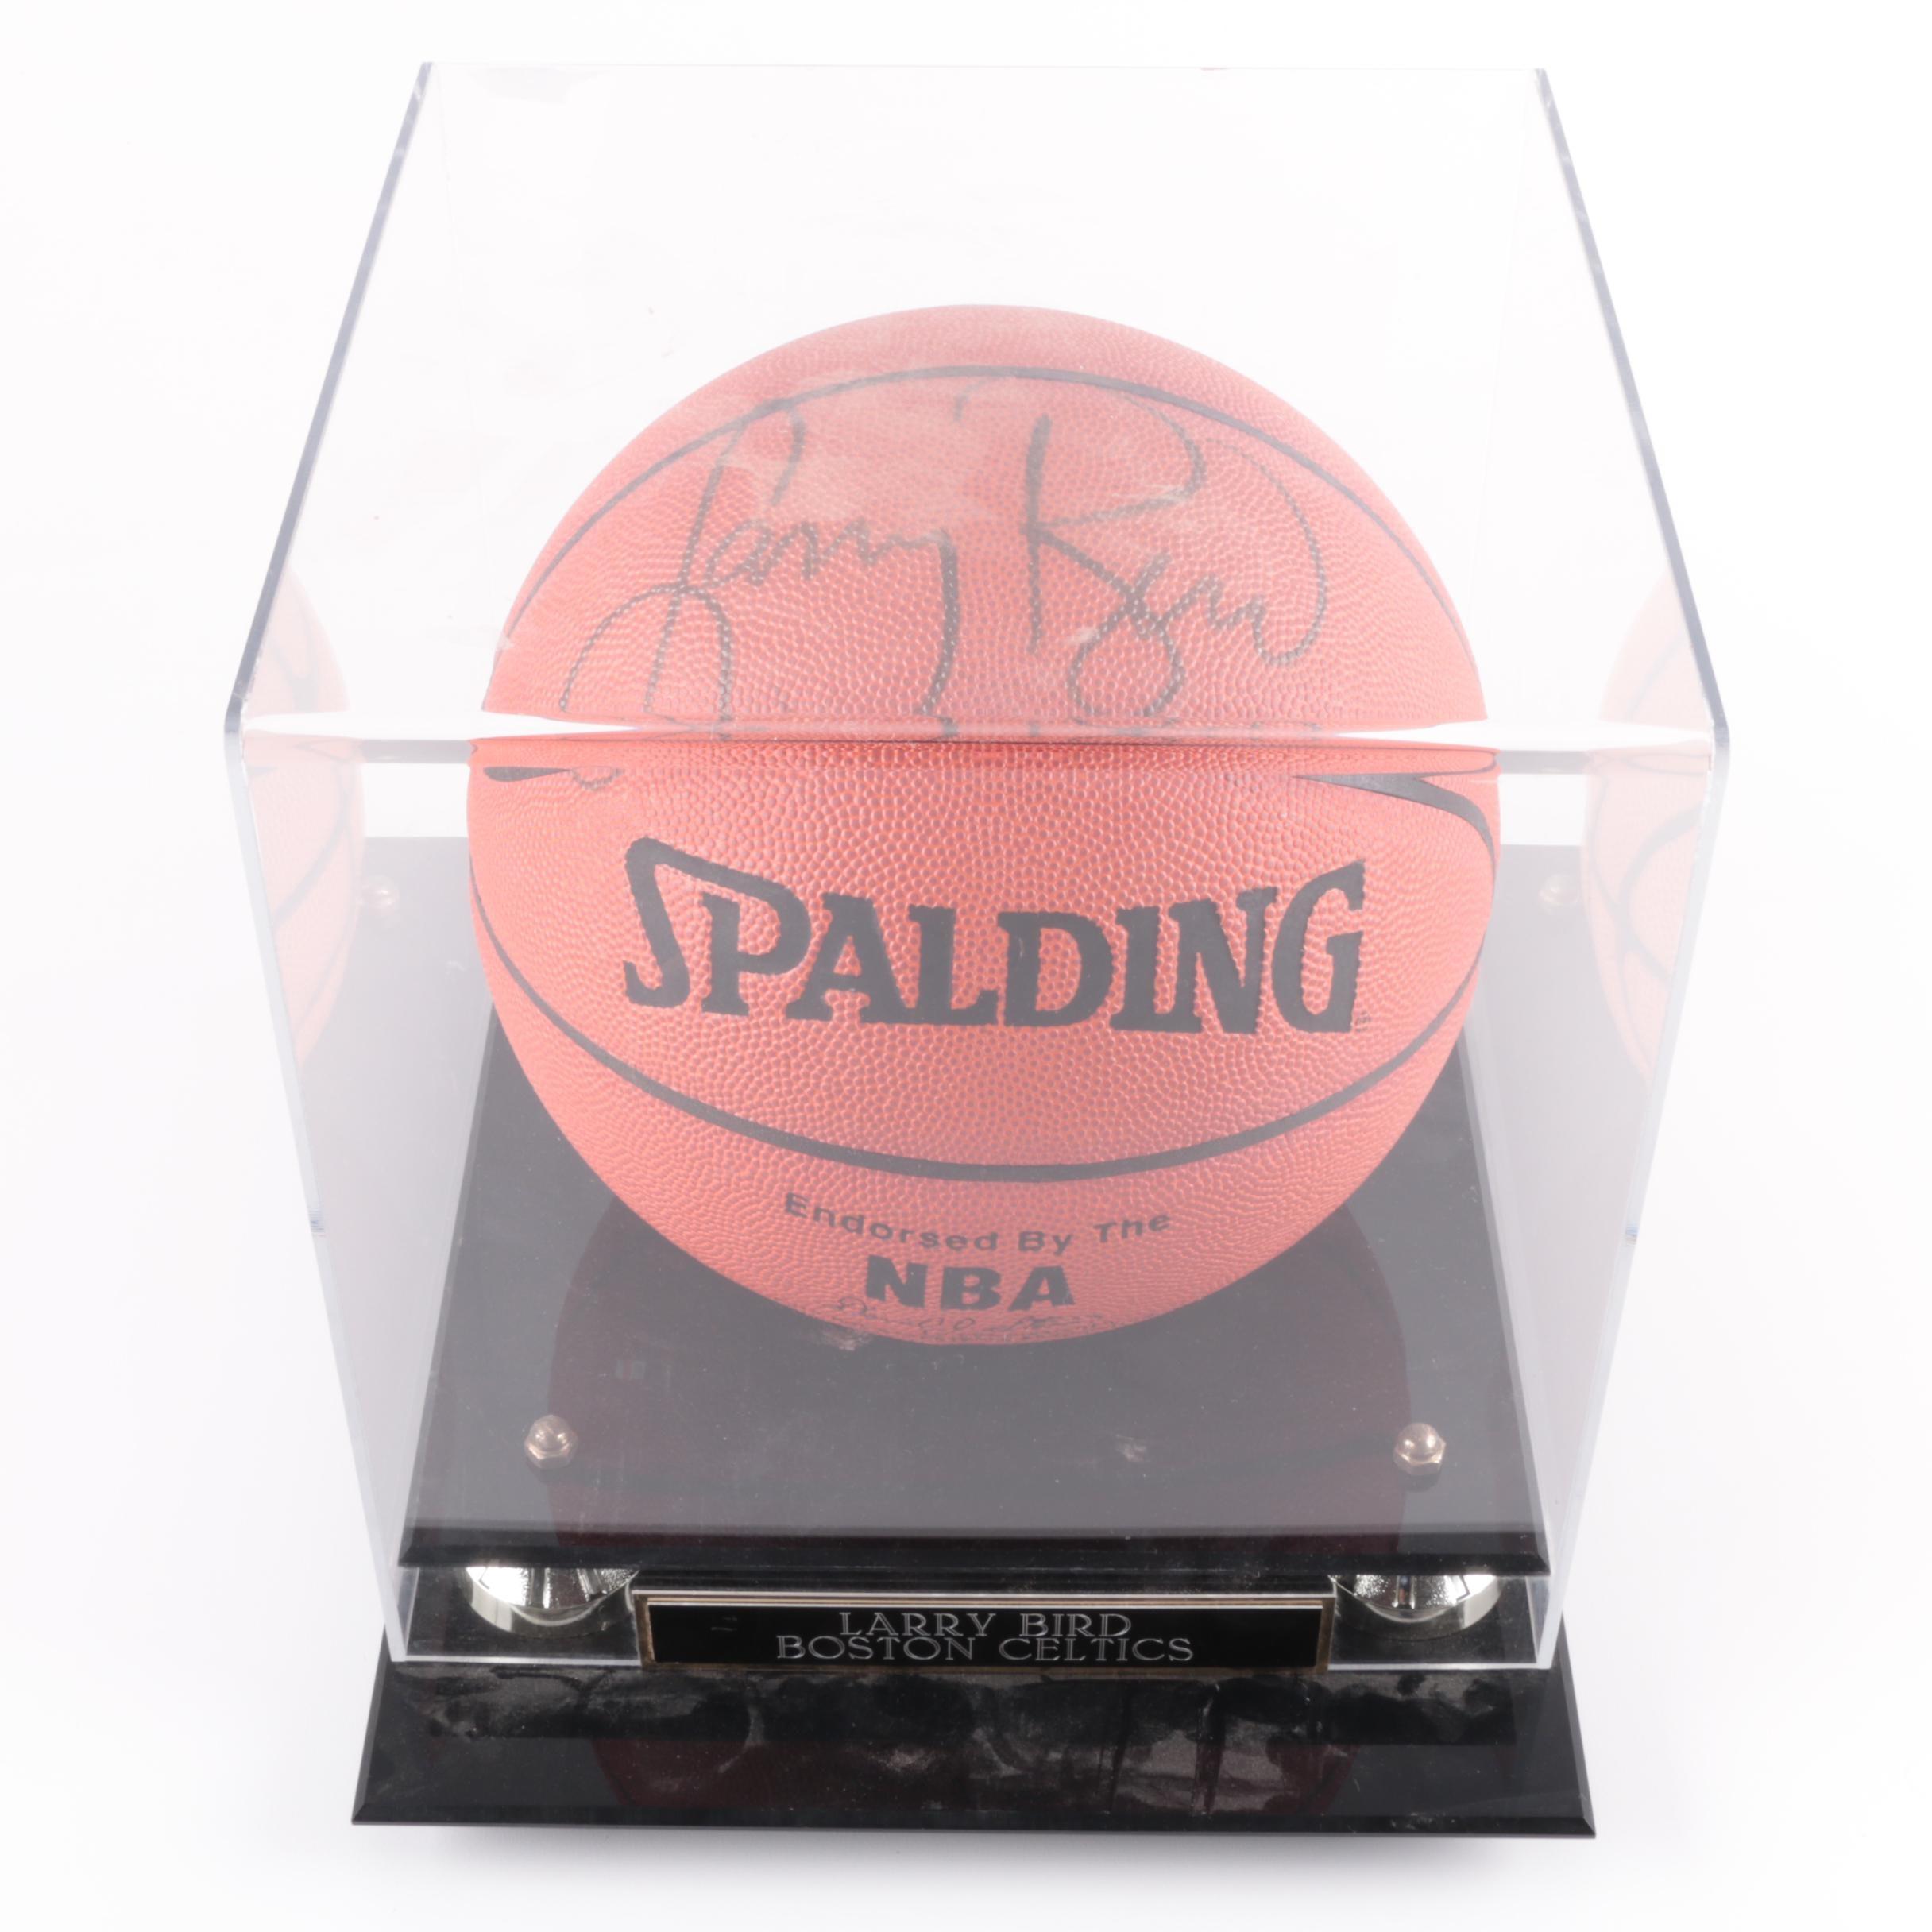 Larry Bird Autographed Basketball - JSA LOA